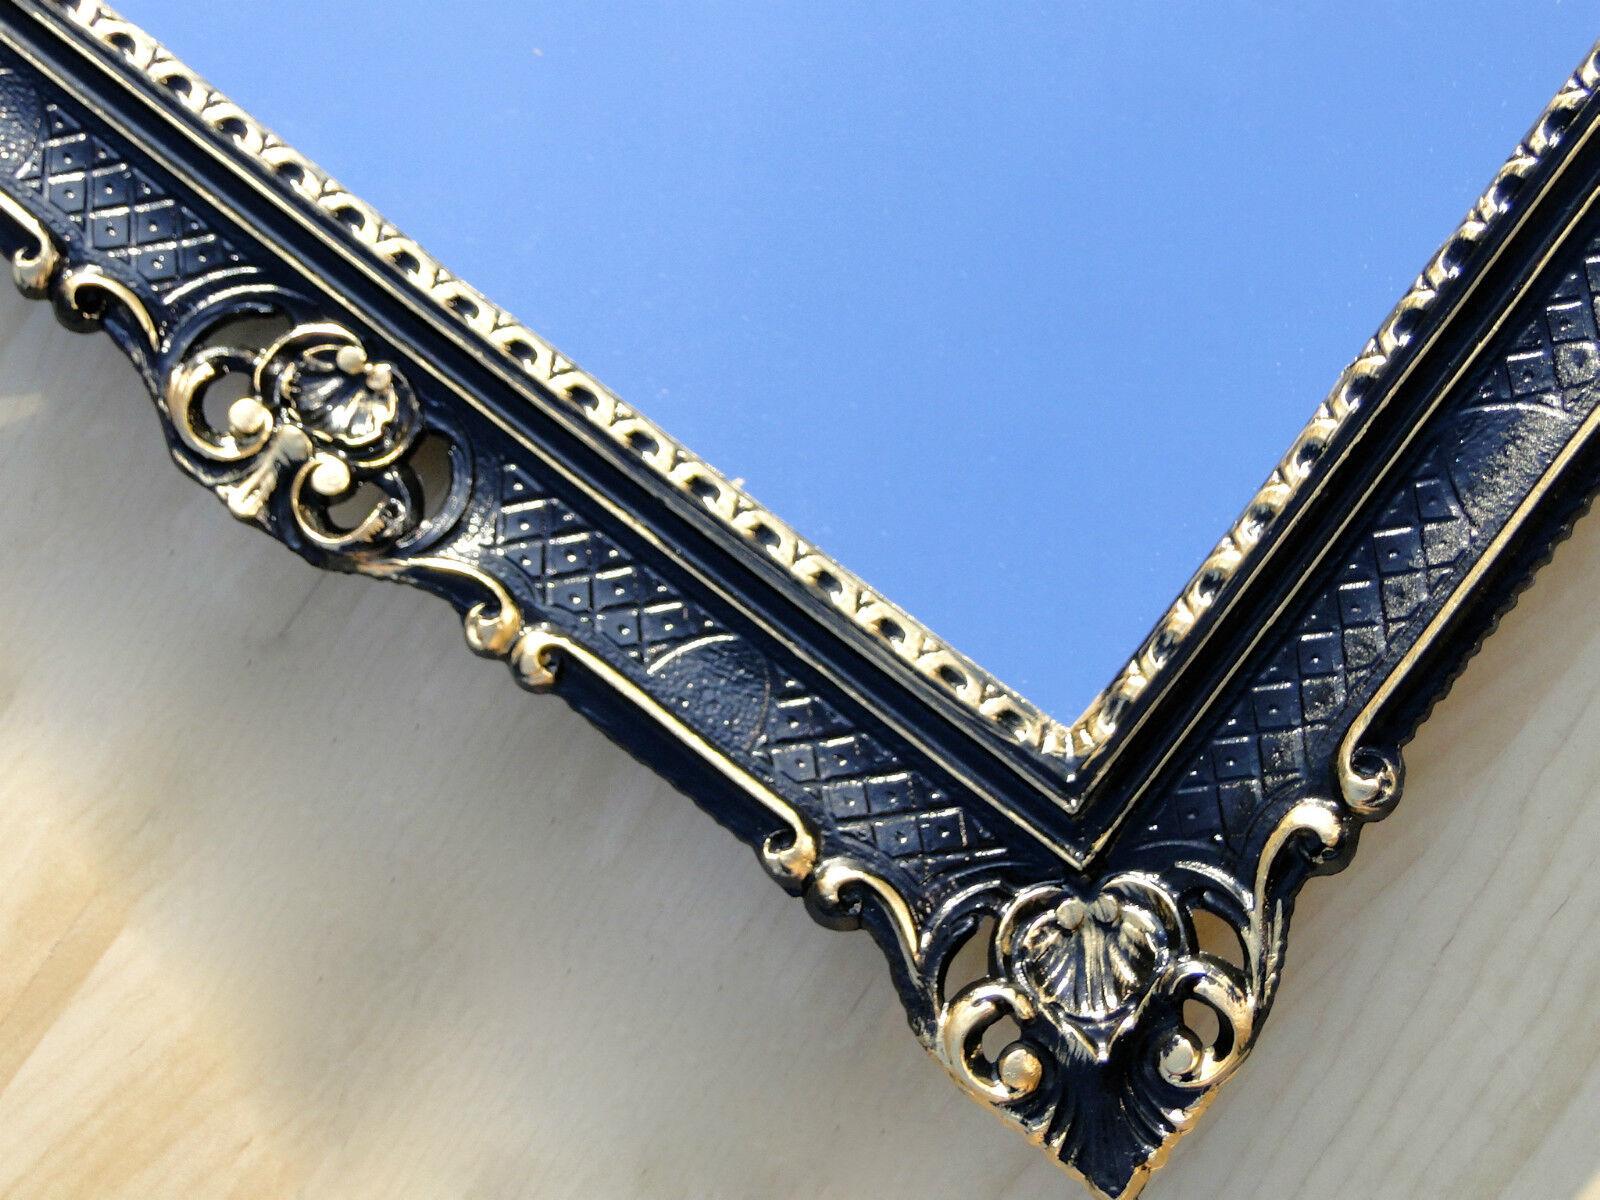 wandspiegel barock gro er spiegel schwarz gold hochglanz. Black Bedroom Furniture Sets. Home Design Ideas